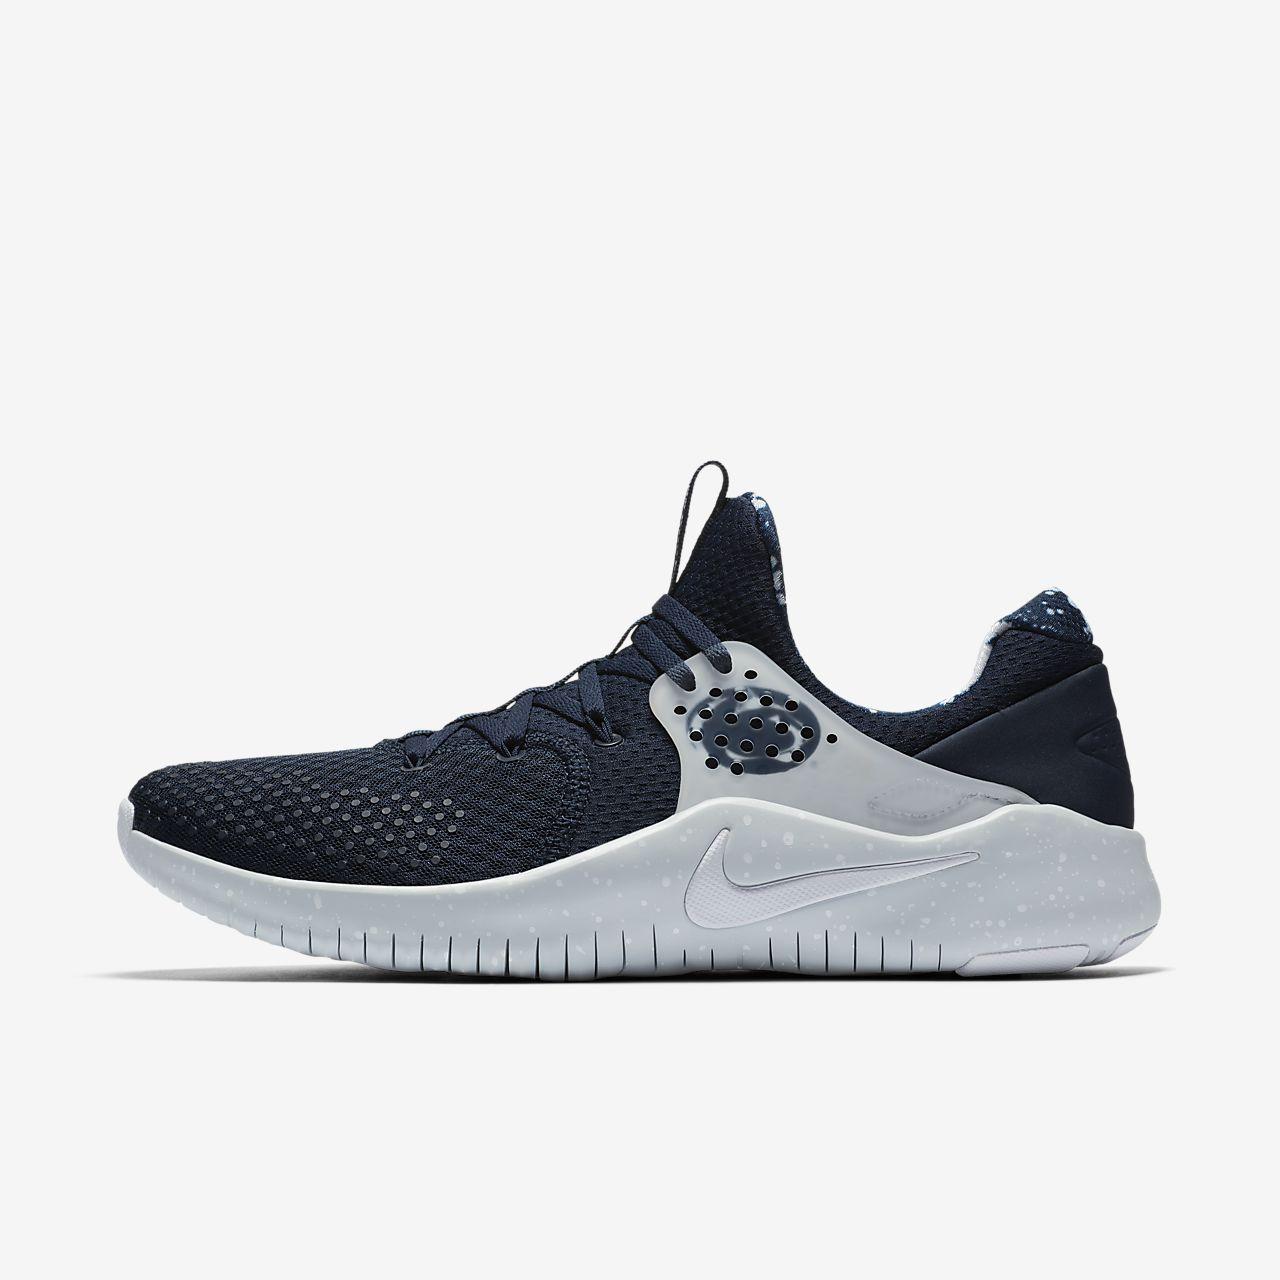 c973c4820e6aa Nike Free TR8 (Penn State) Gym Gameday Shoe. Nike.com